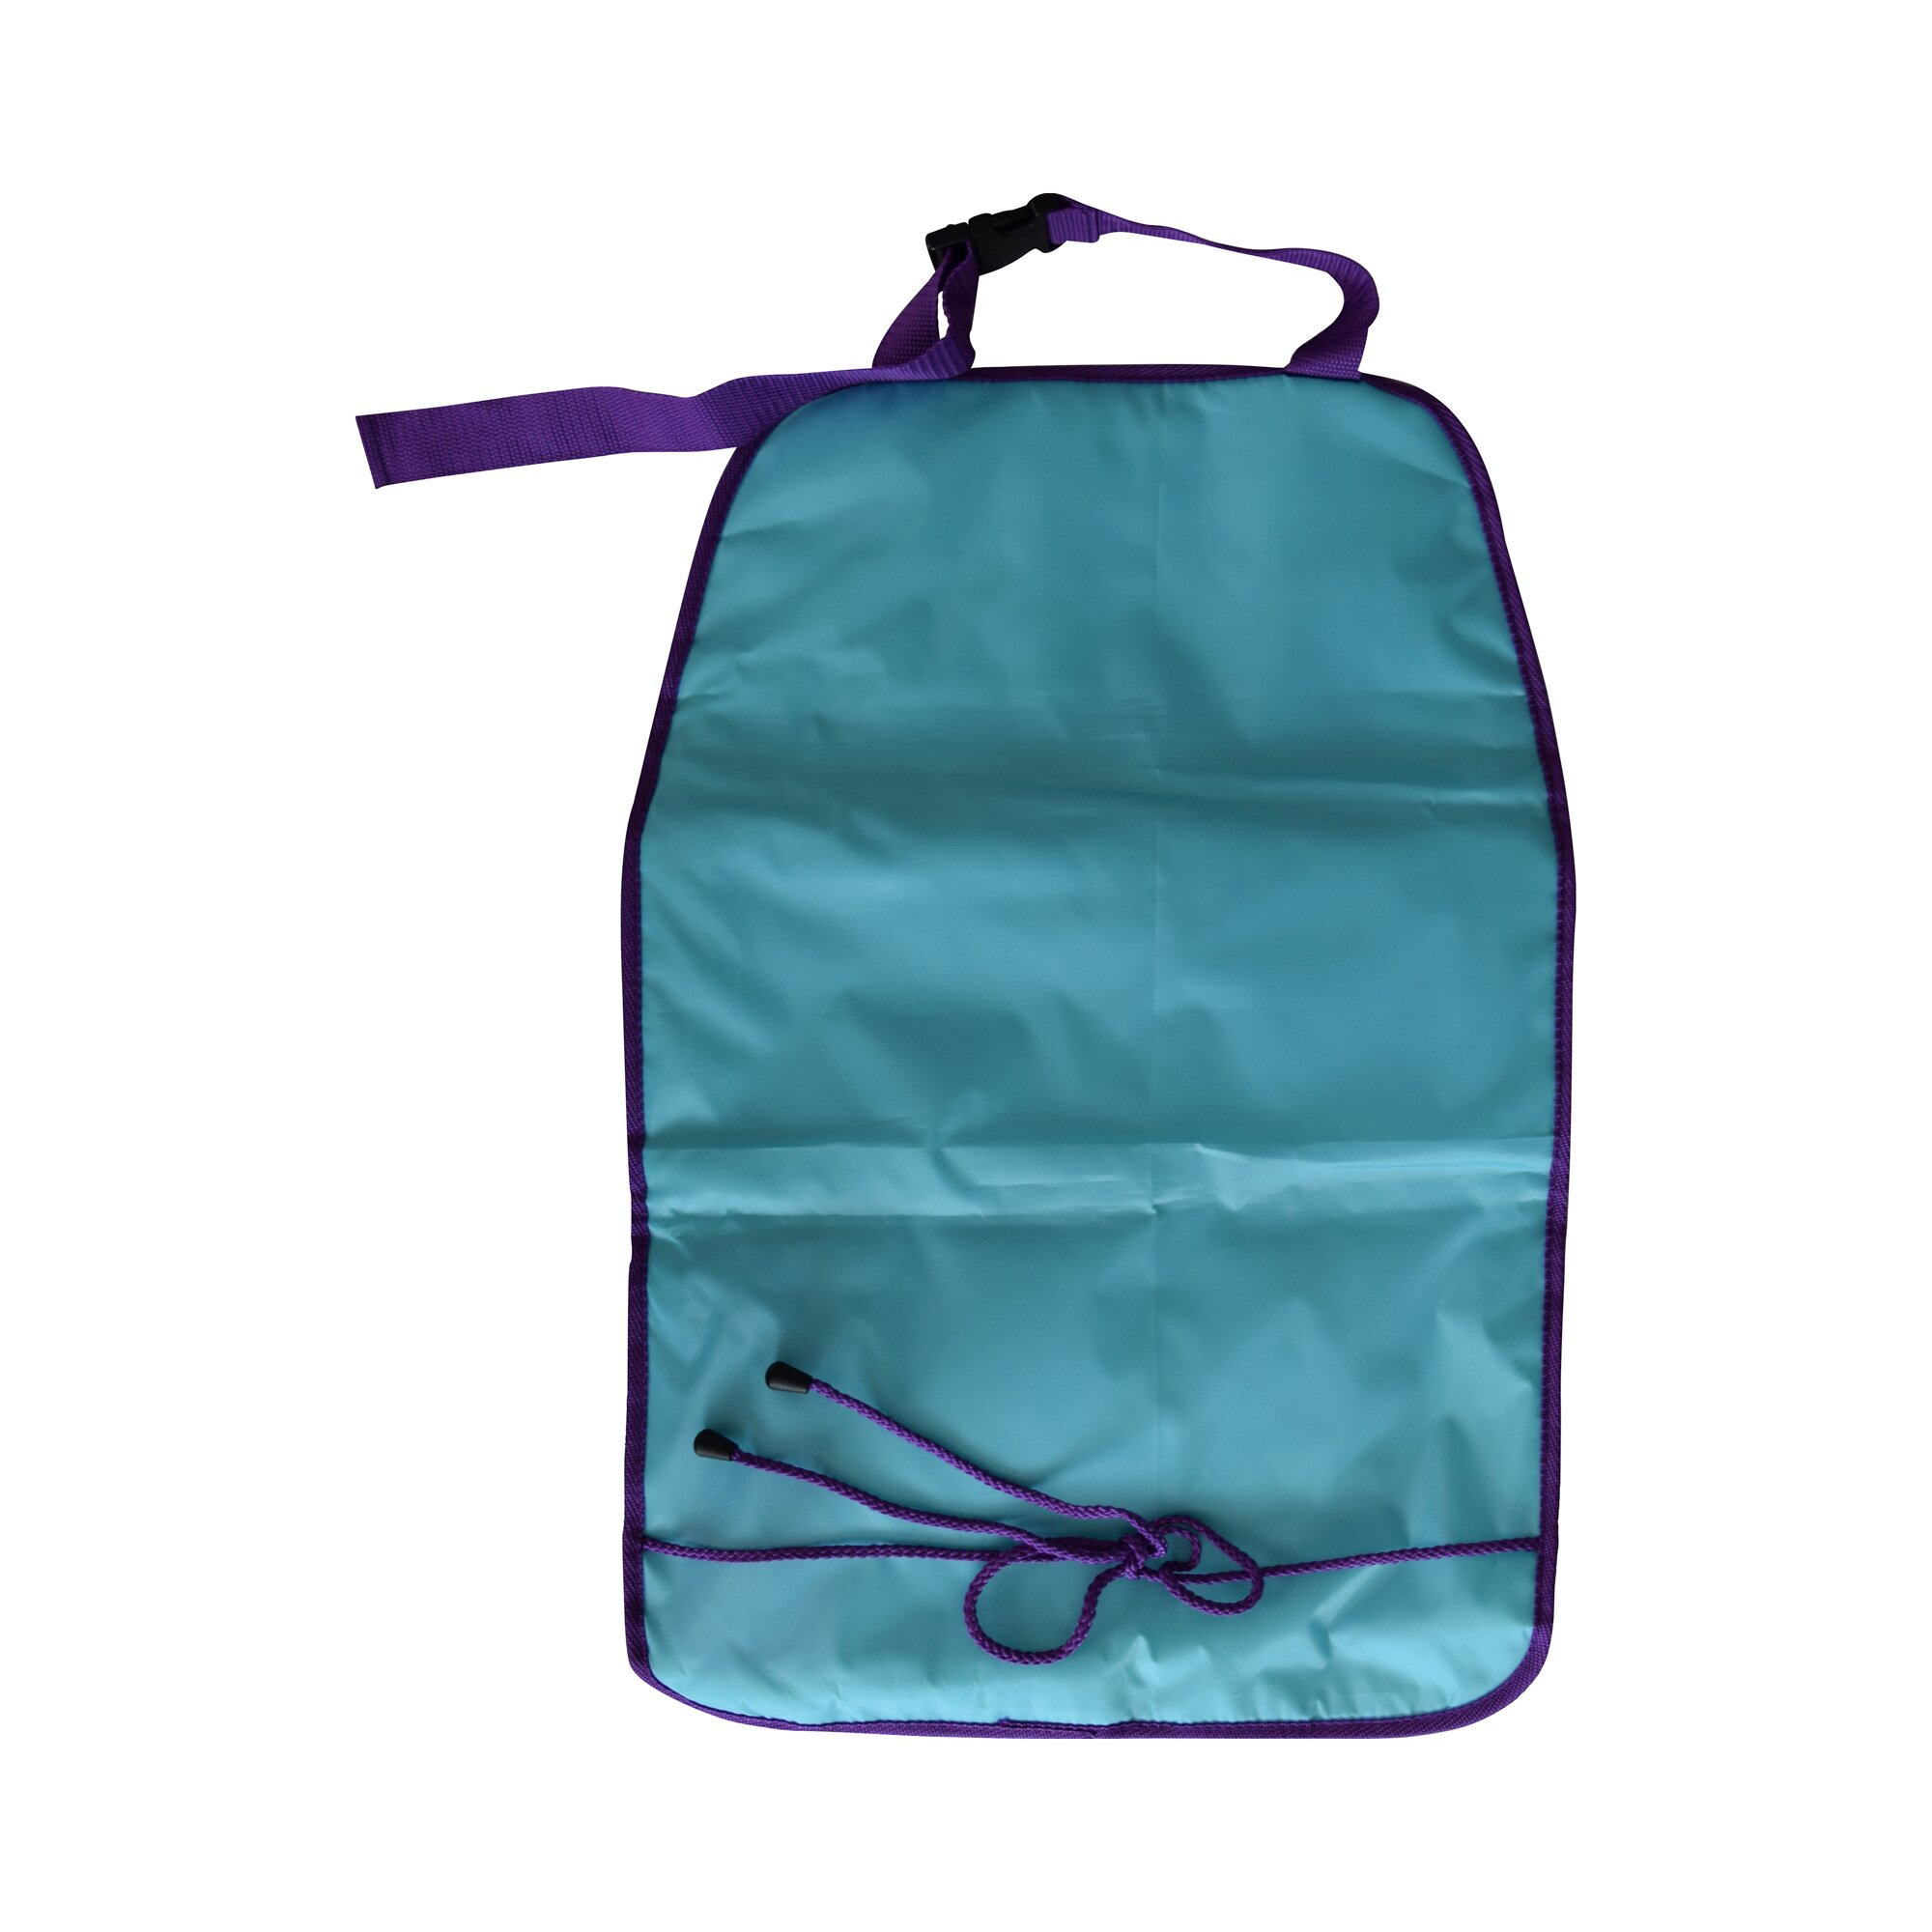 disney-frozen-spielzeugtasche-blau, 11.99 EUR @ babywalz-de